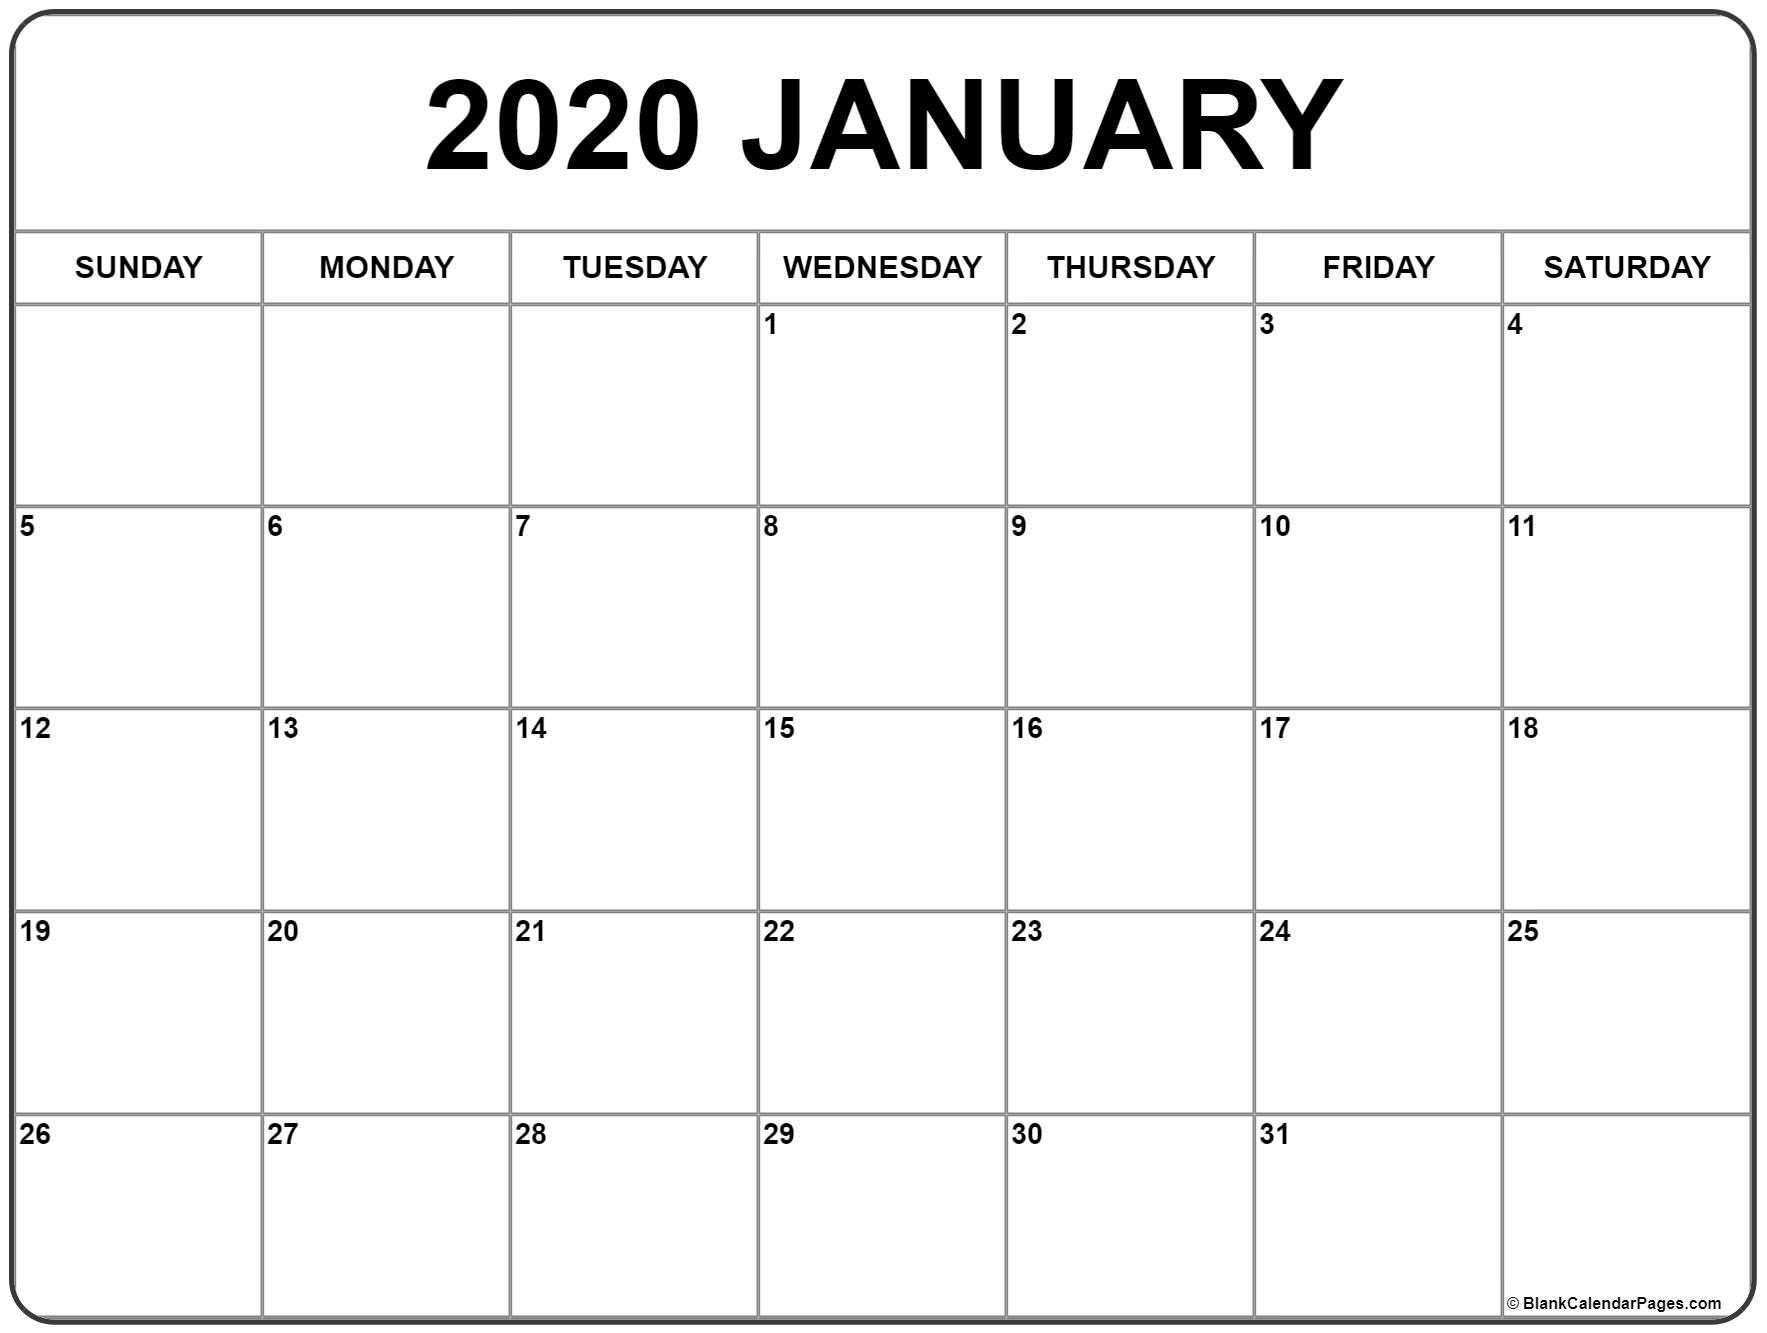 Get 2020 Printable Calendar With Space To Write | Calendar Printables Free Blank